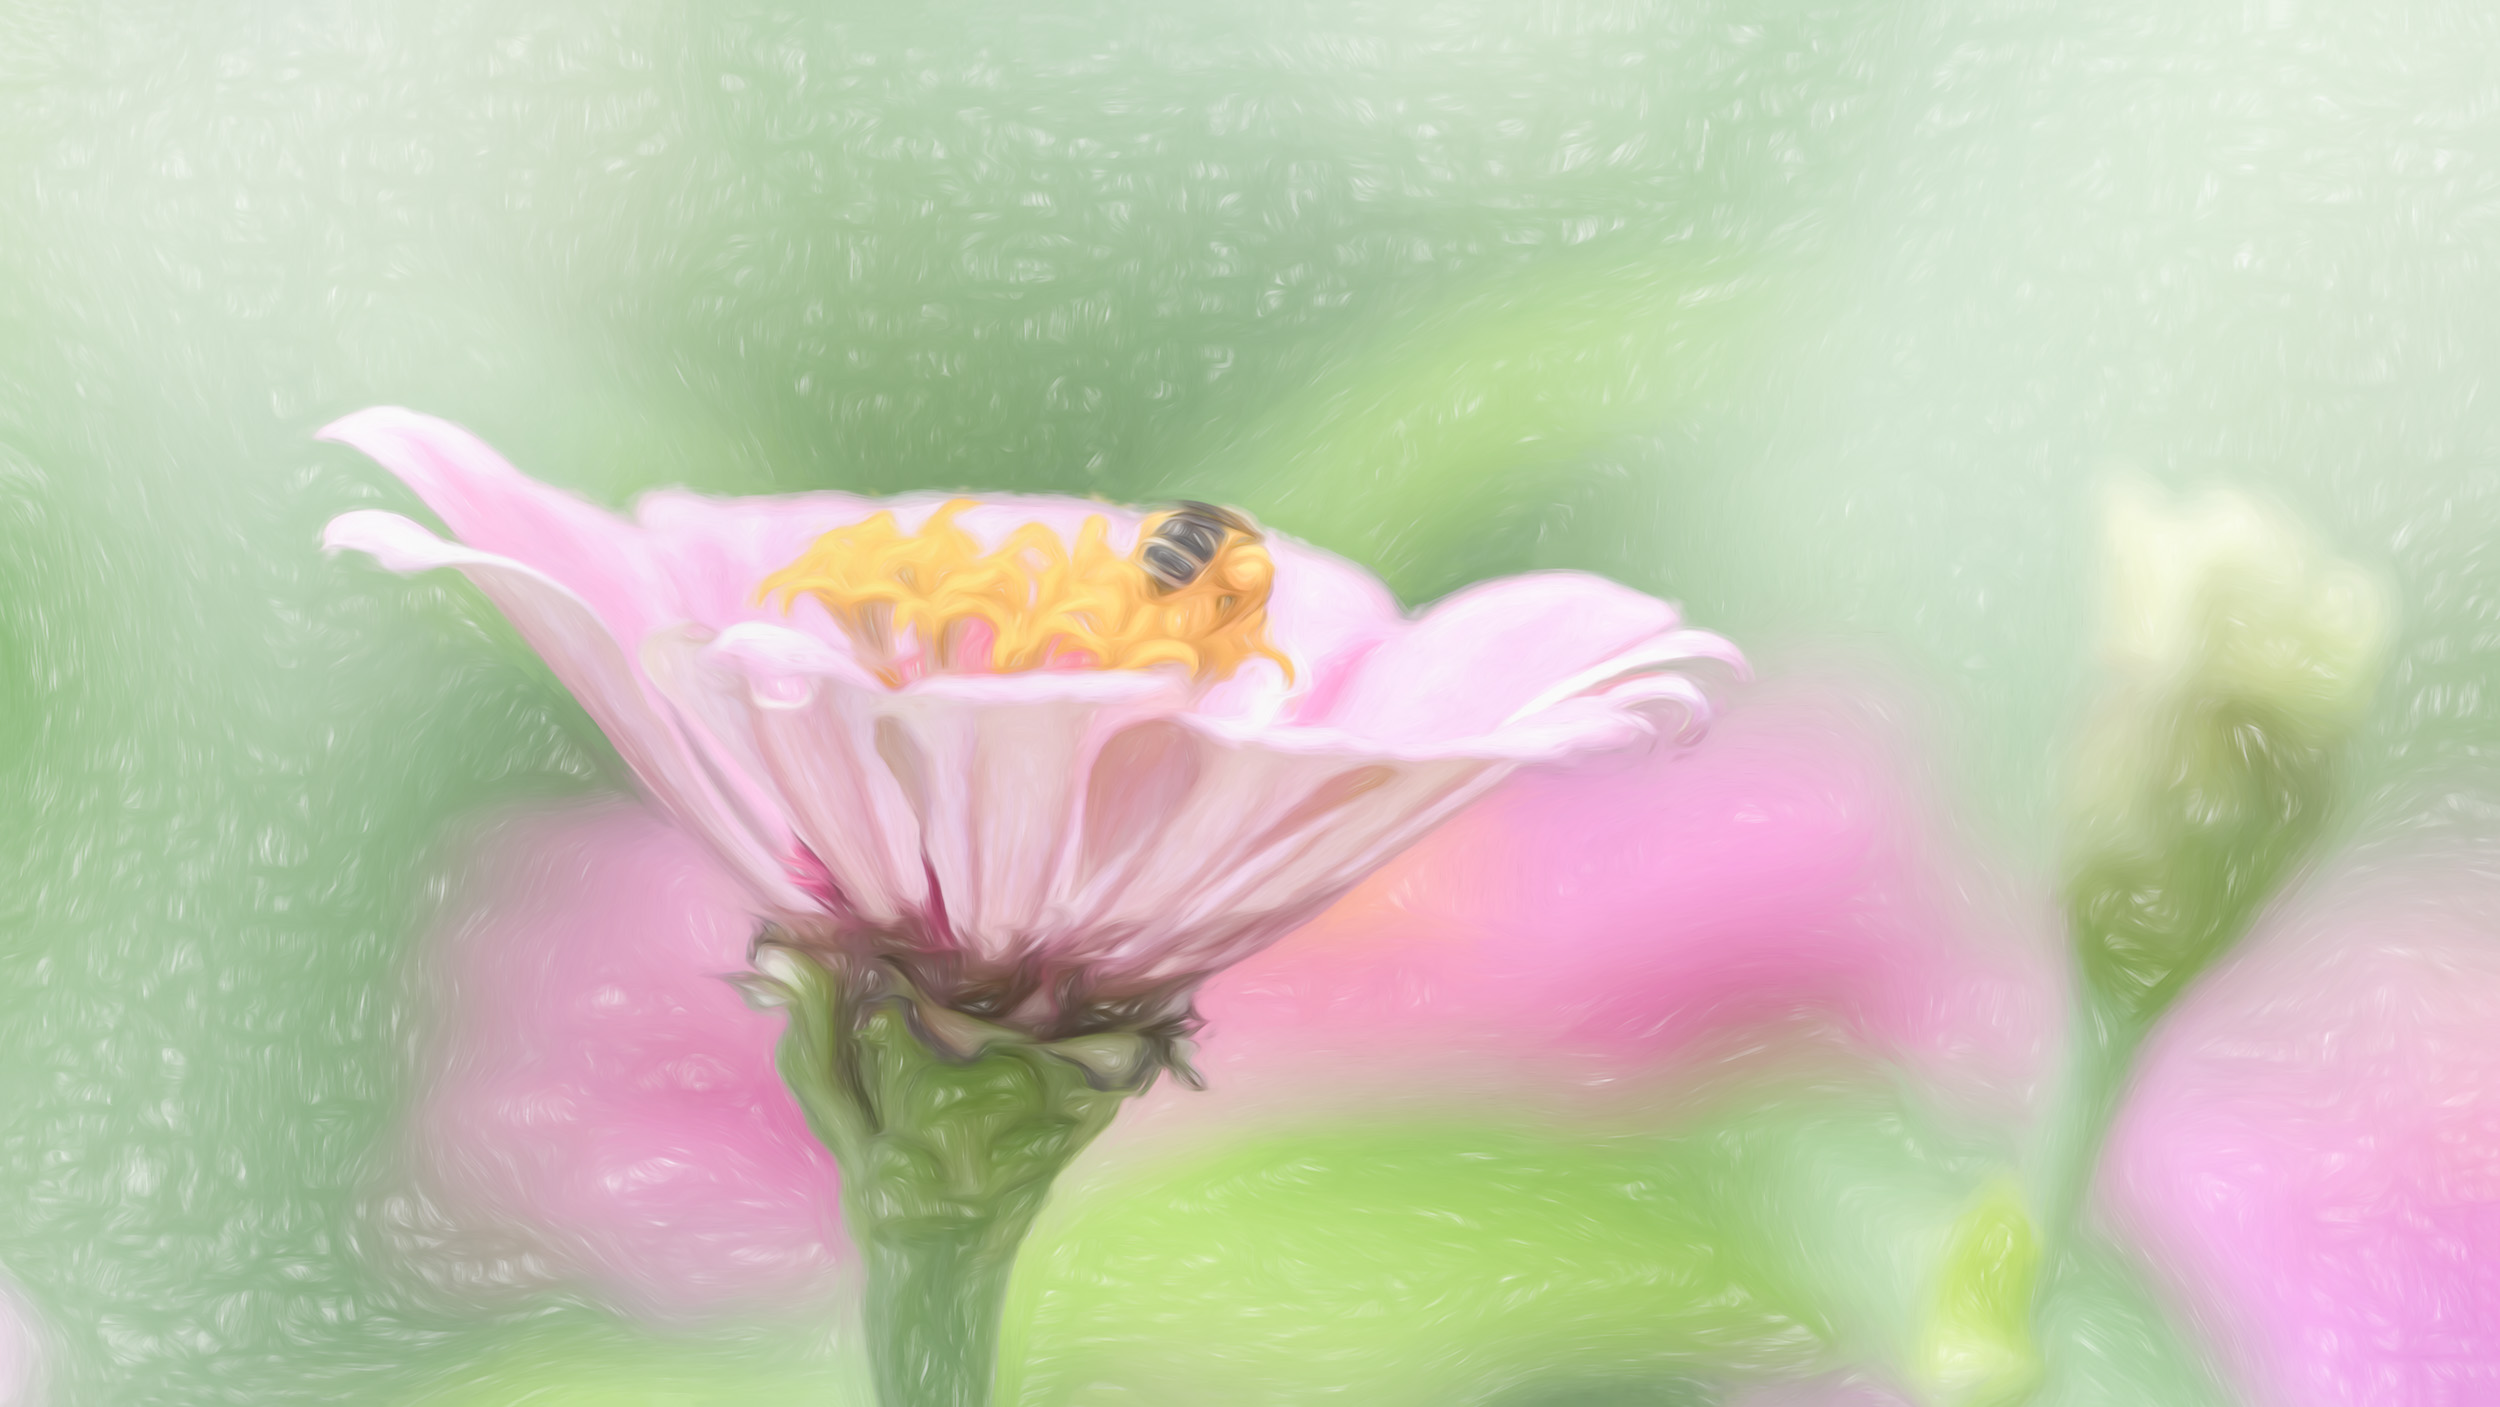 """Simplicity"" - Photography Artist Kevin Sibbitt"